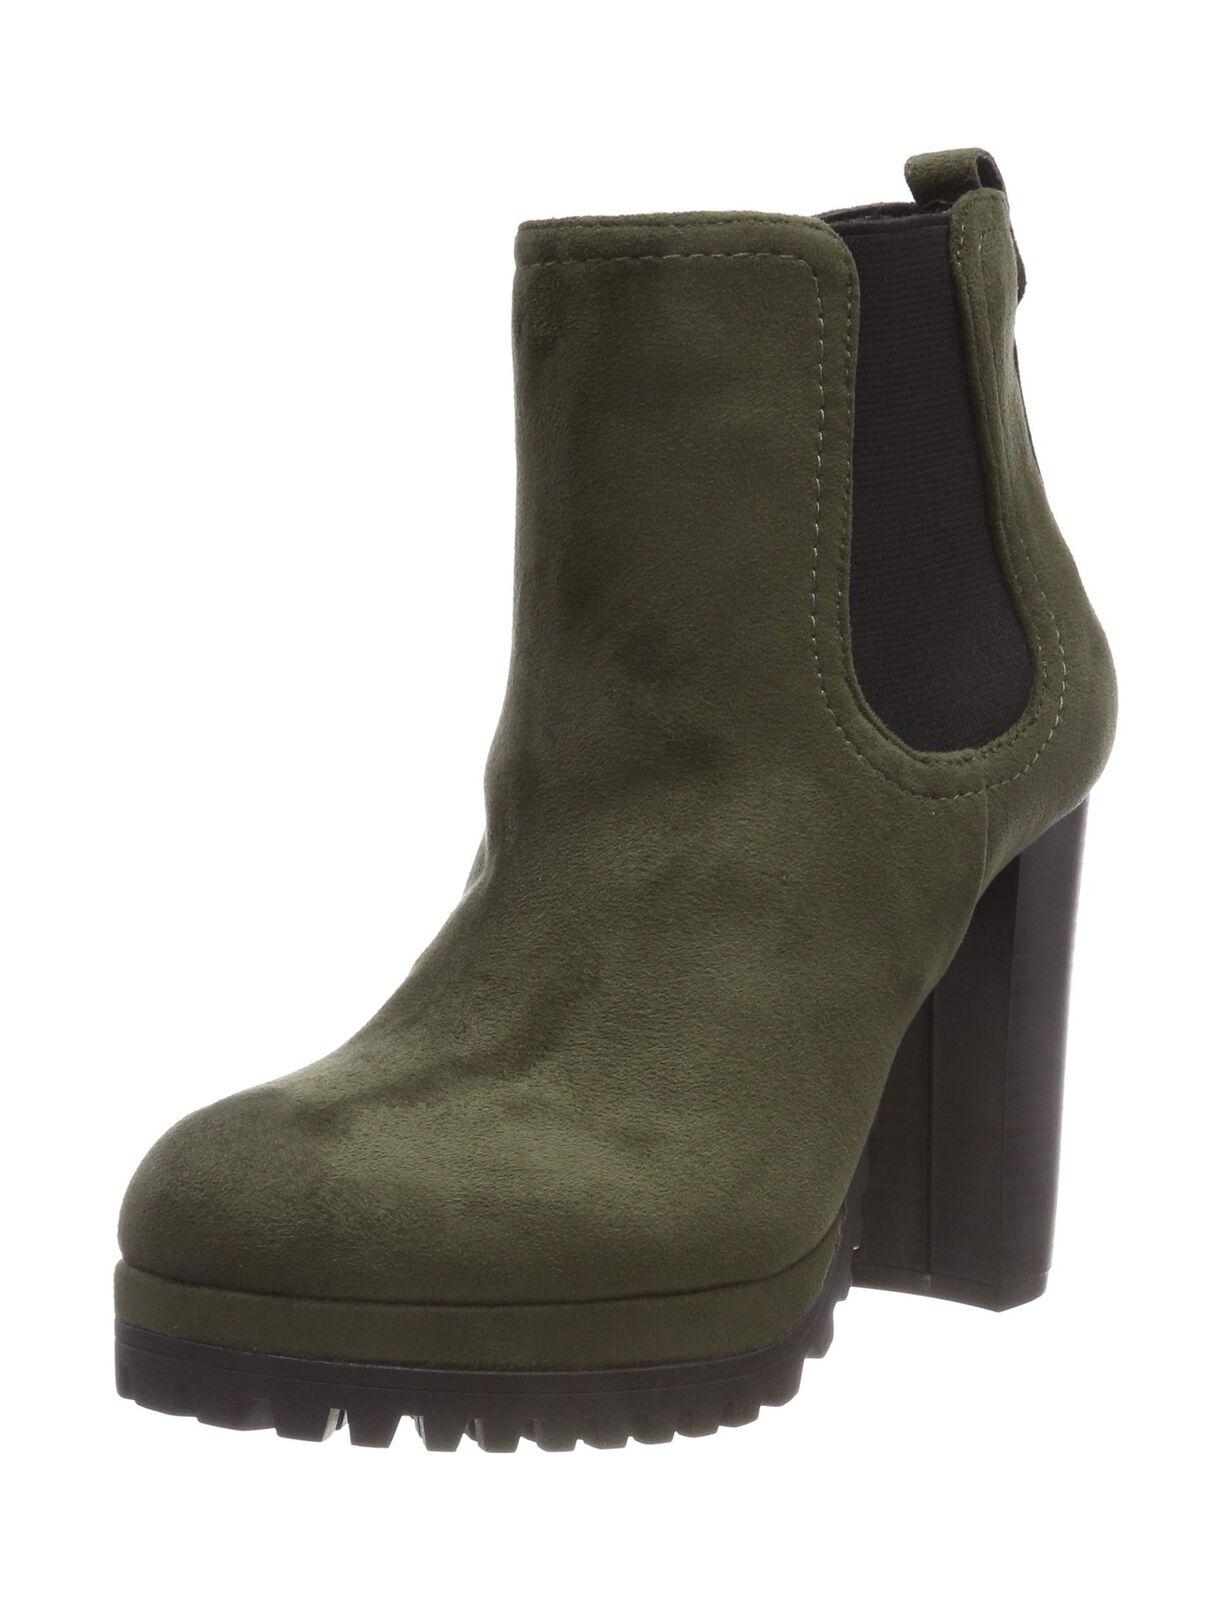 Buffalo Women''s Canary Fabric Ankle Boots Green (Kaki 00) 4 UK